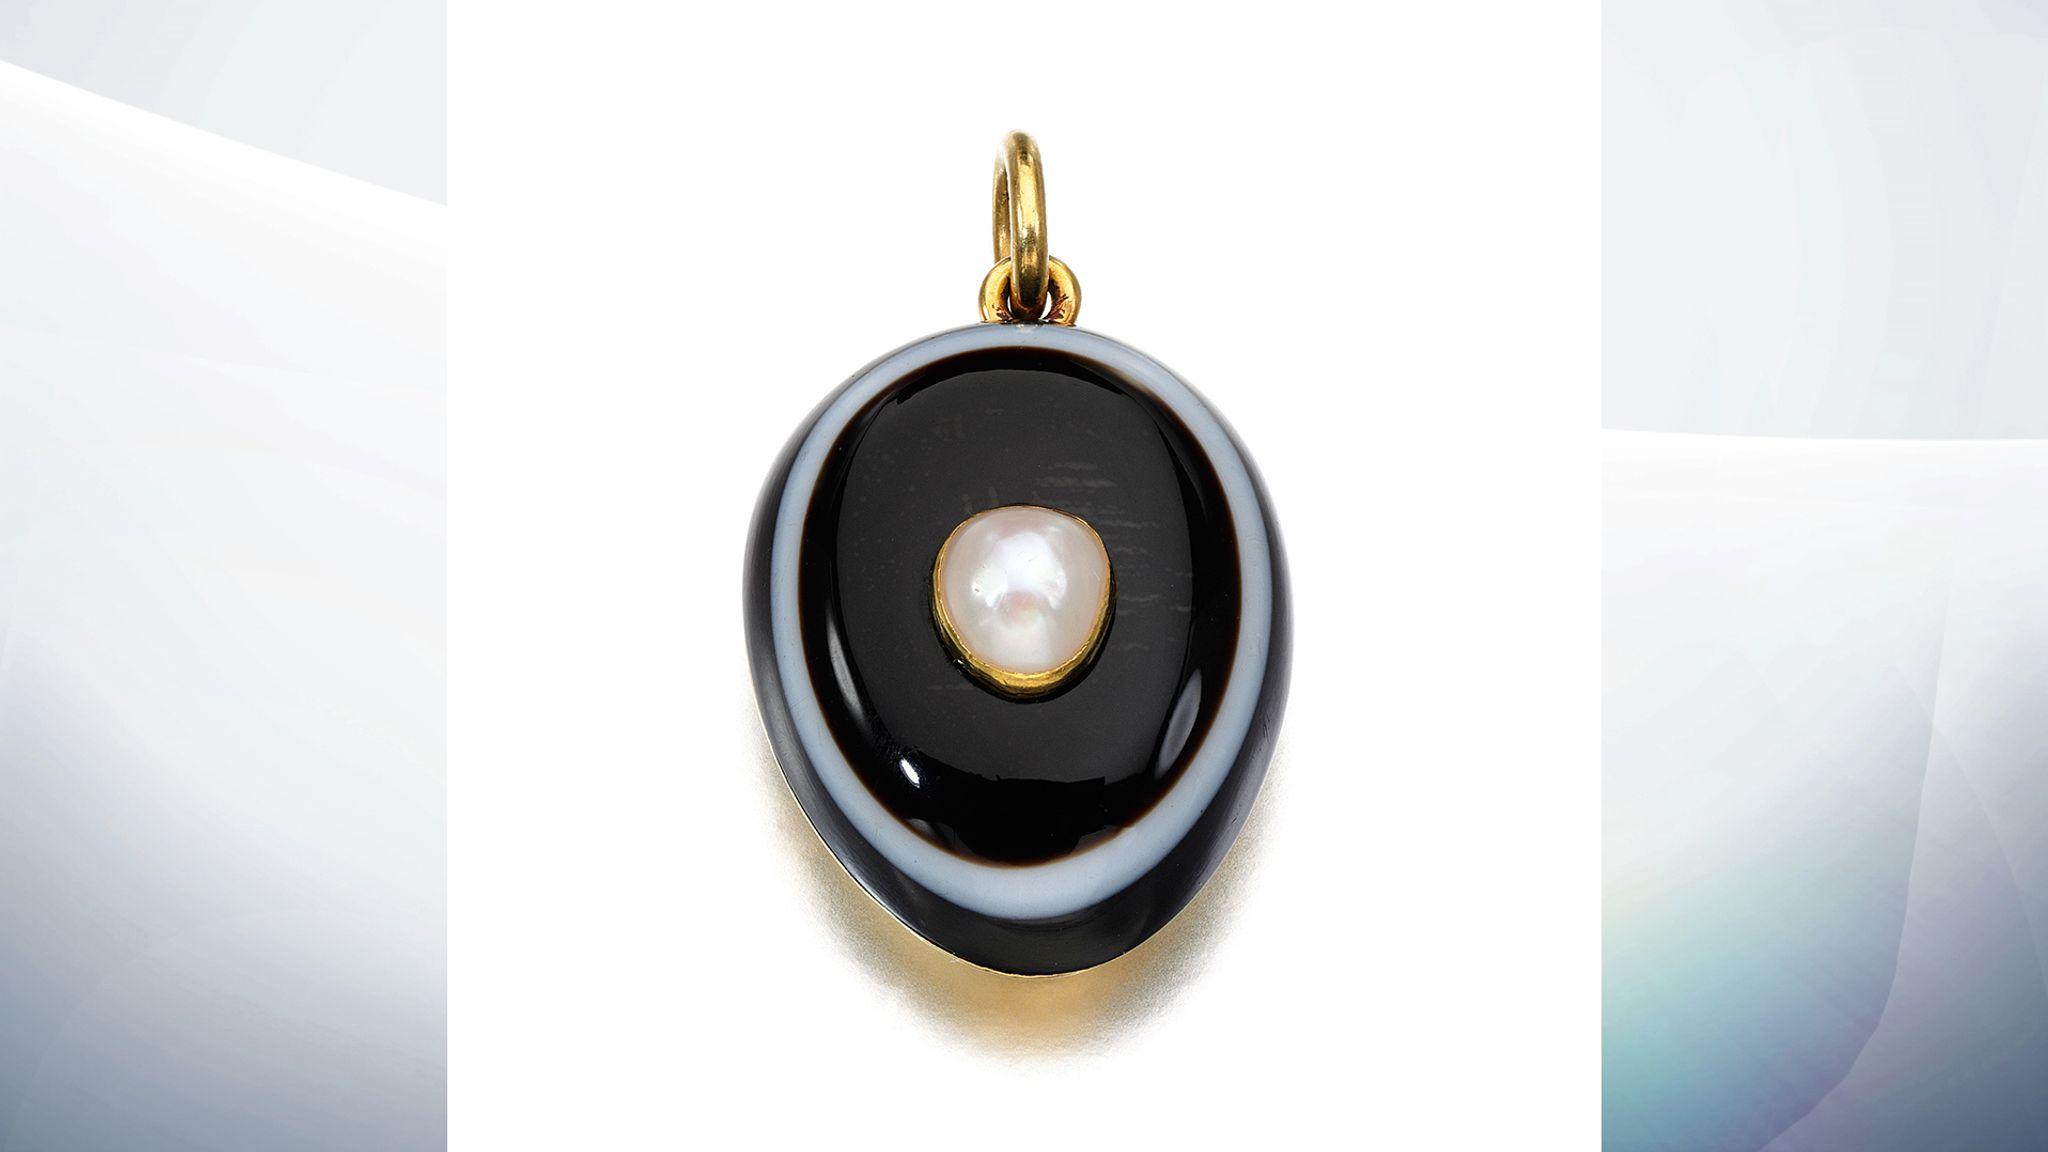 Драгоценности королевы Виктории впервые выставят на аукцион This agate and pearl pendant is estimated to fetch 1000 to 1500